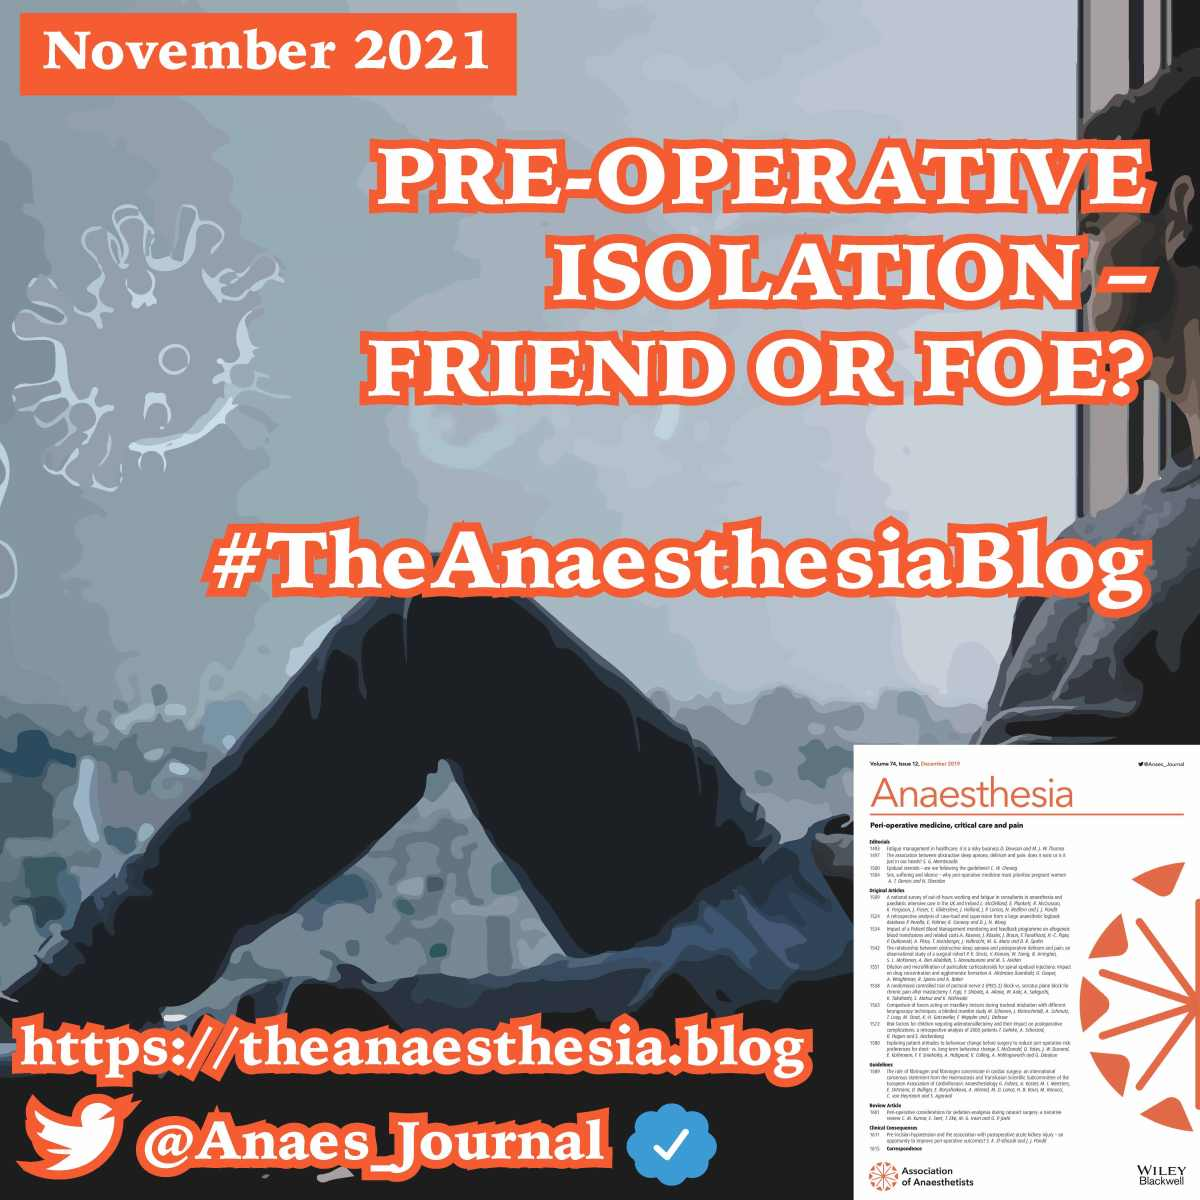 Pre-operative isolation – friend orfoe?